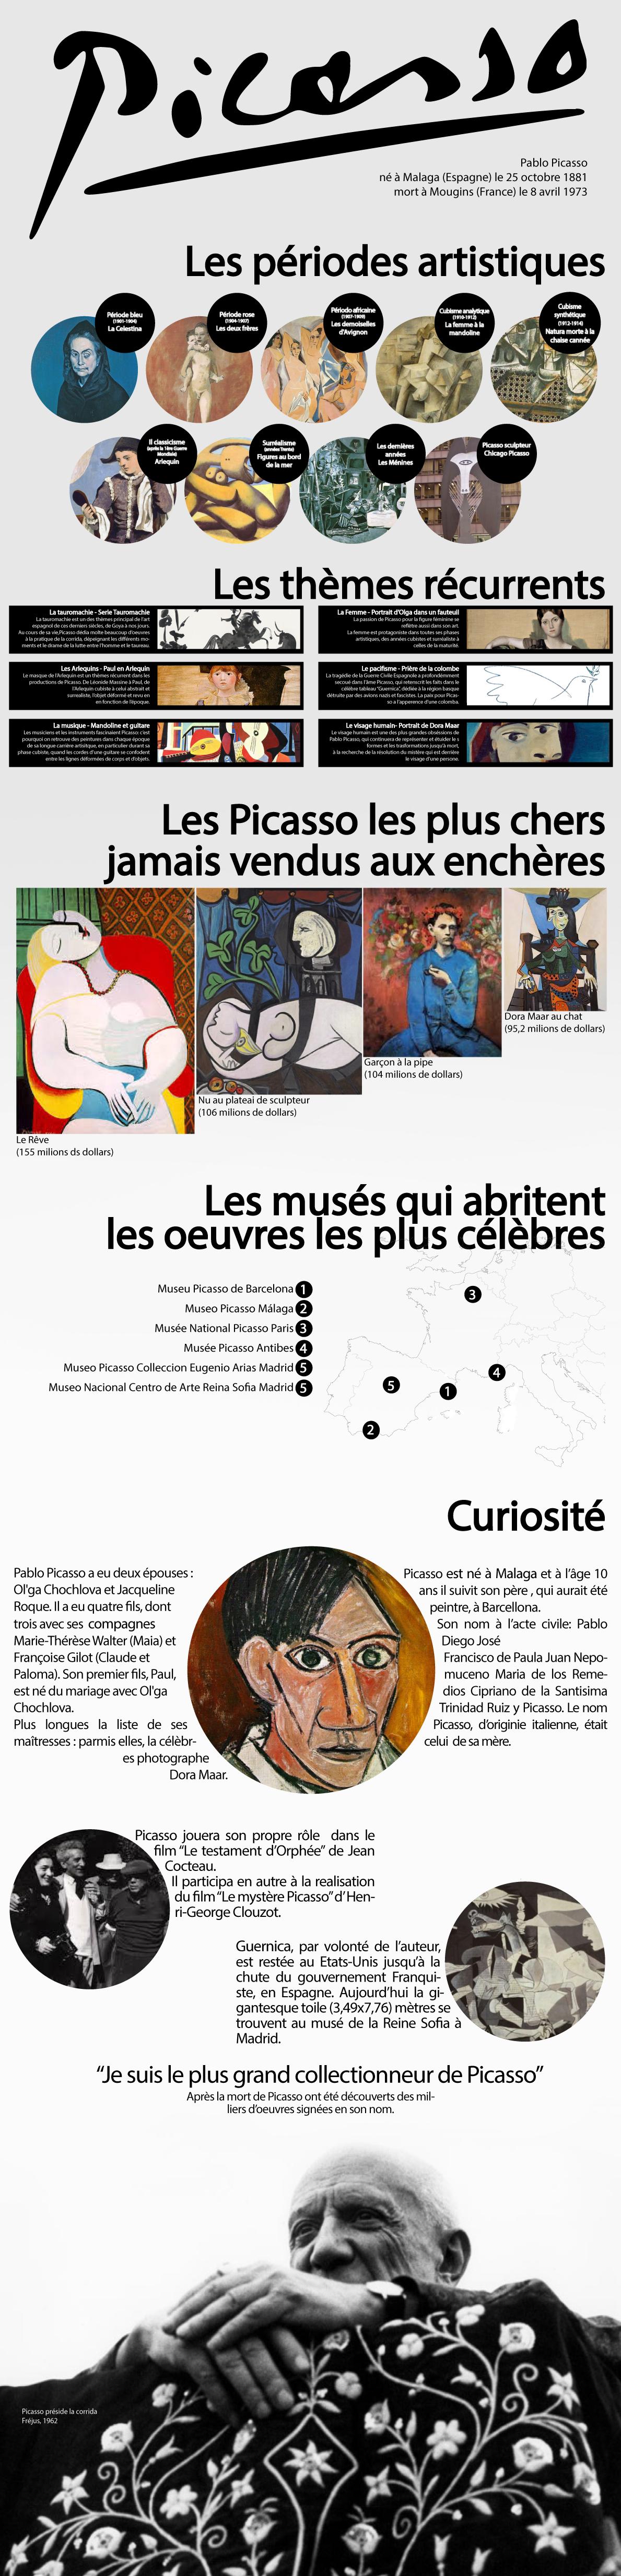 picasso-infographie-fr-s